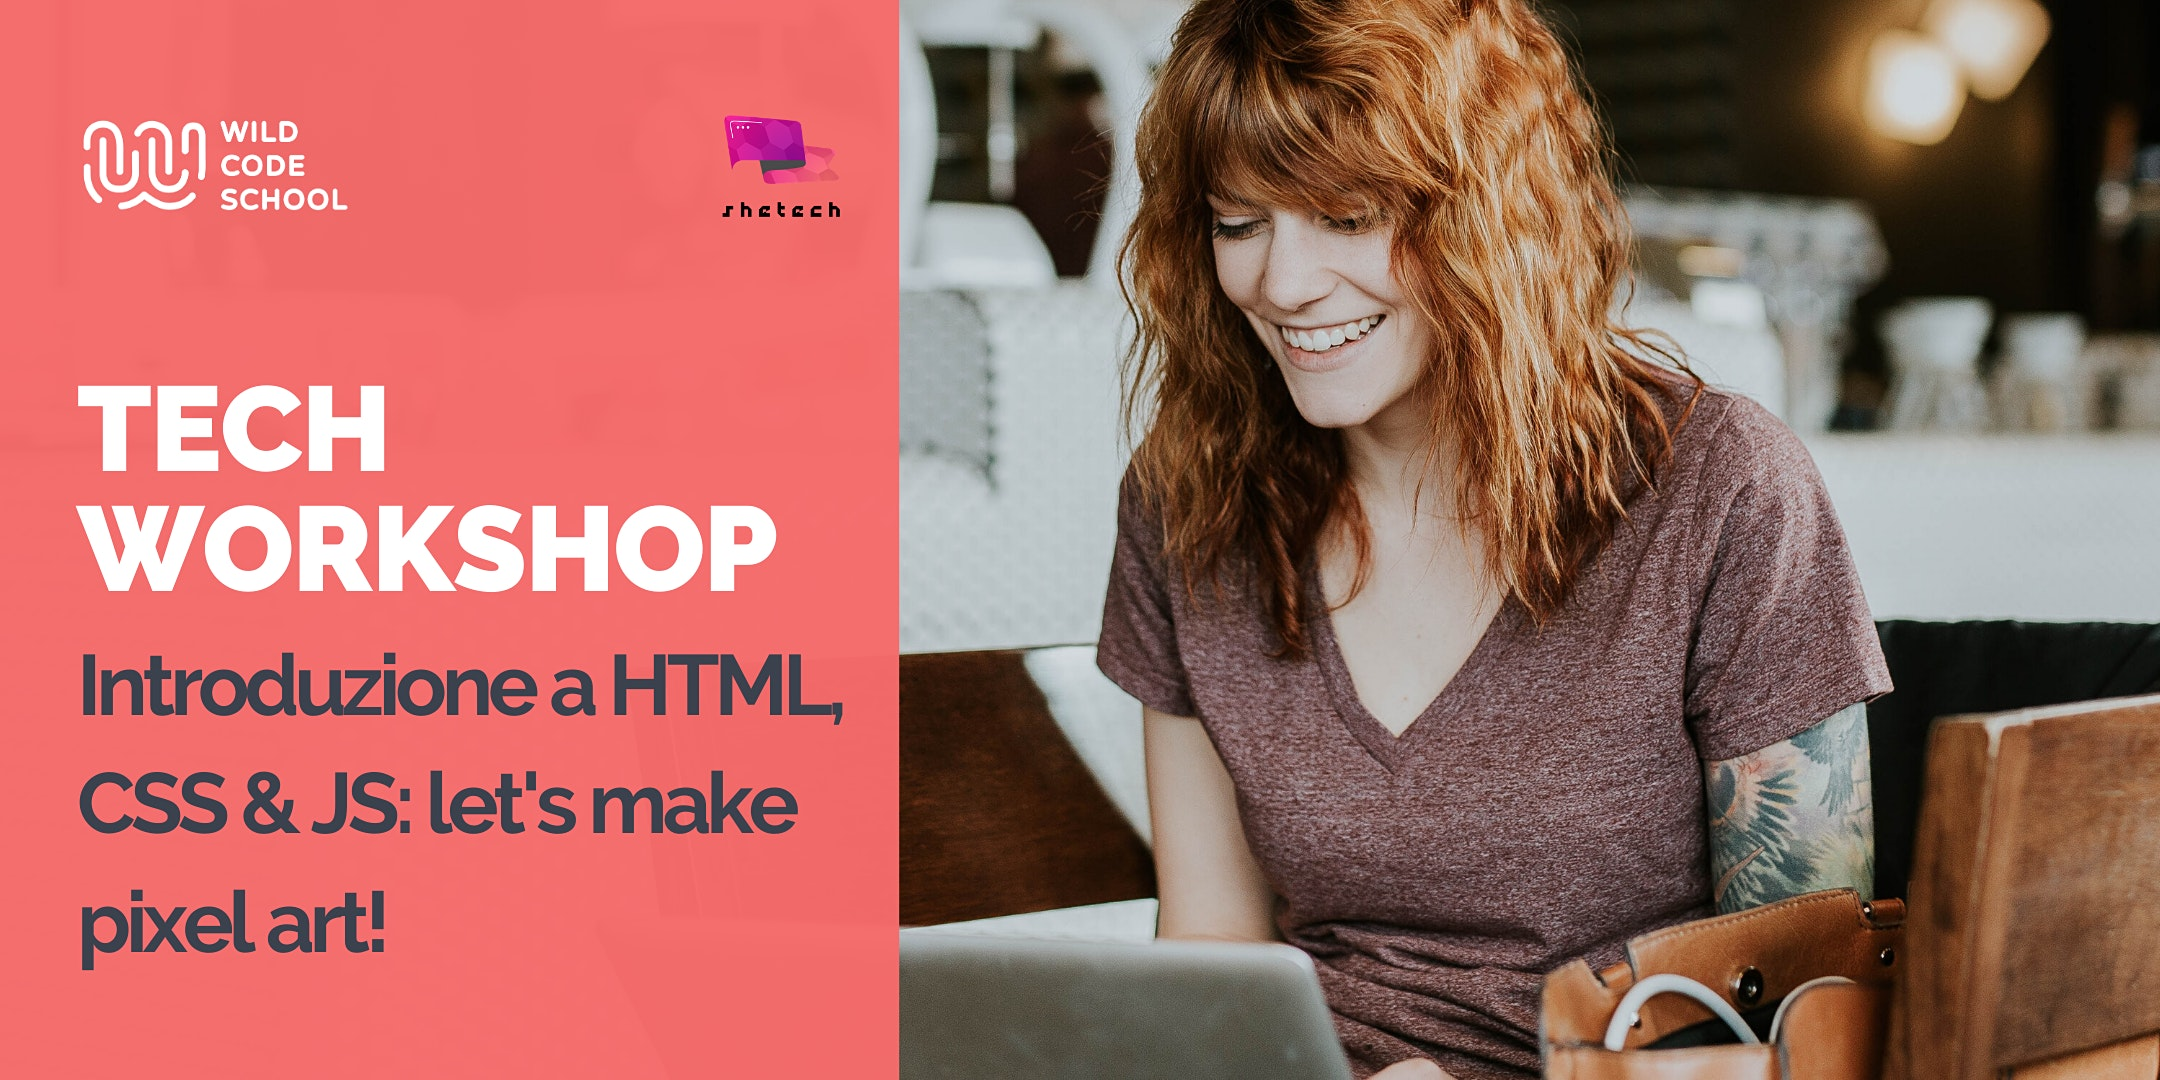 Webinar - Introduzione a HTML, CSS & JS: let's make pixel art!